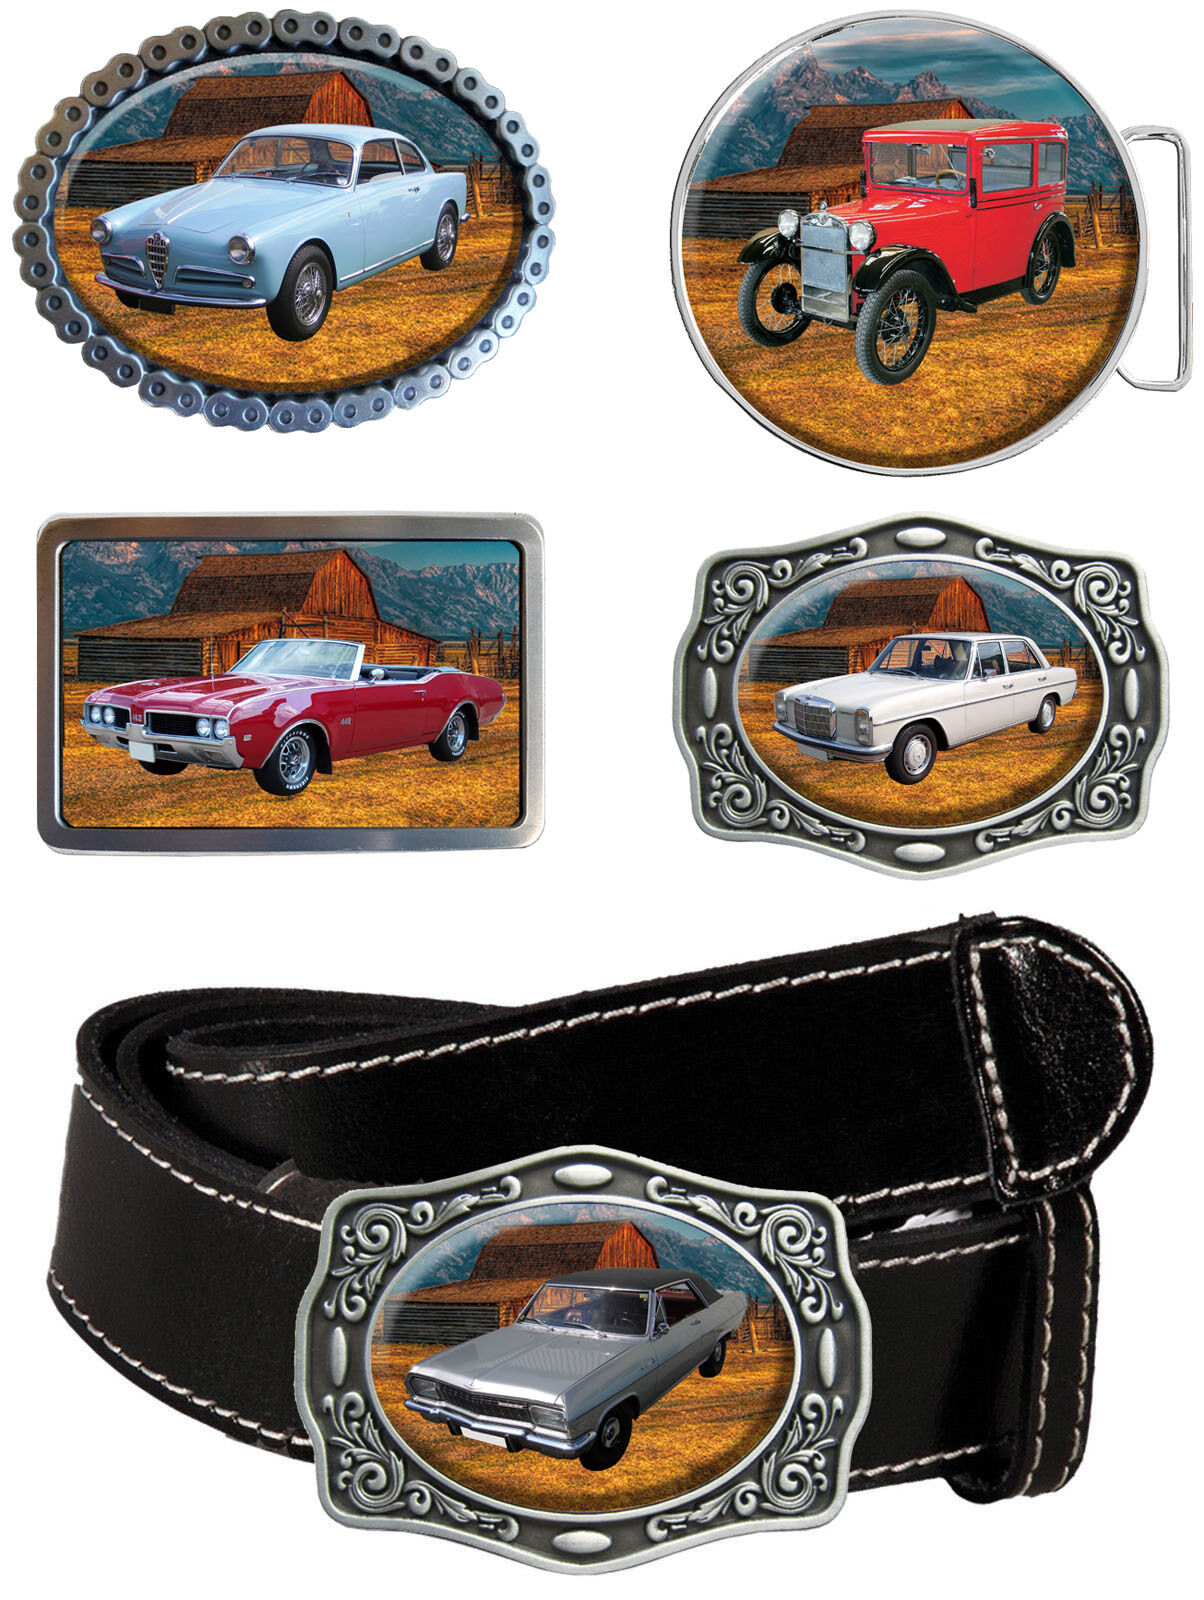 Gürtelschnalle historische Fahrzeuge Historic & Classic Car - Marke A Oldtimer